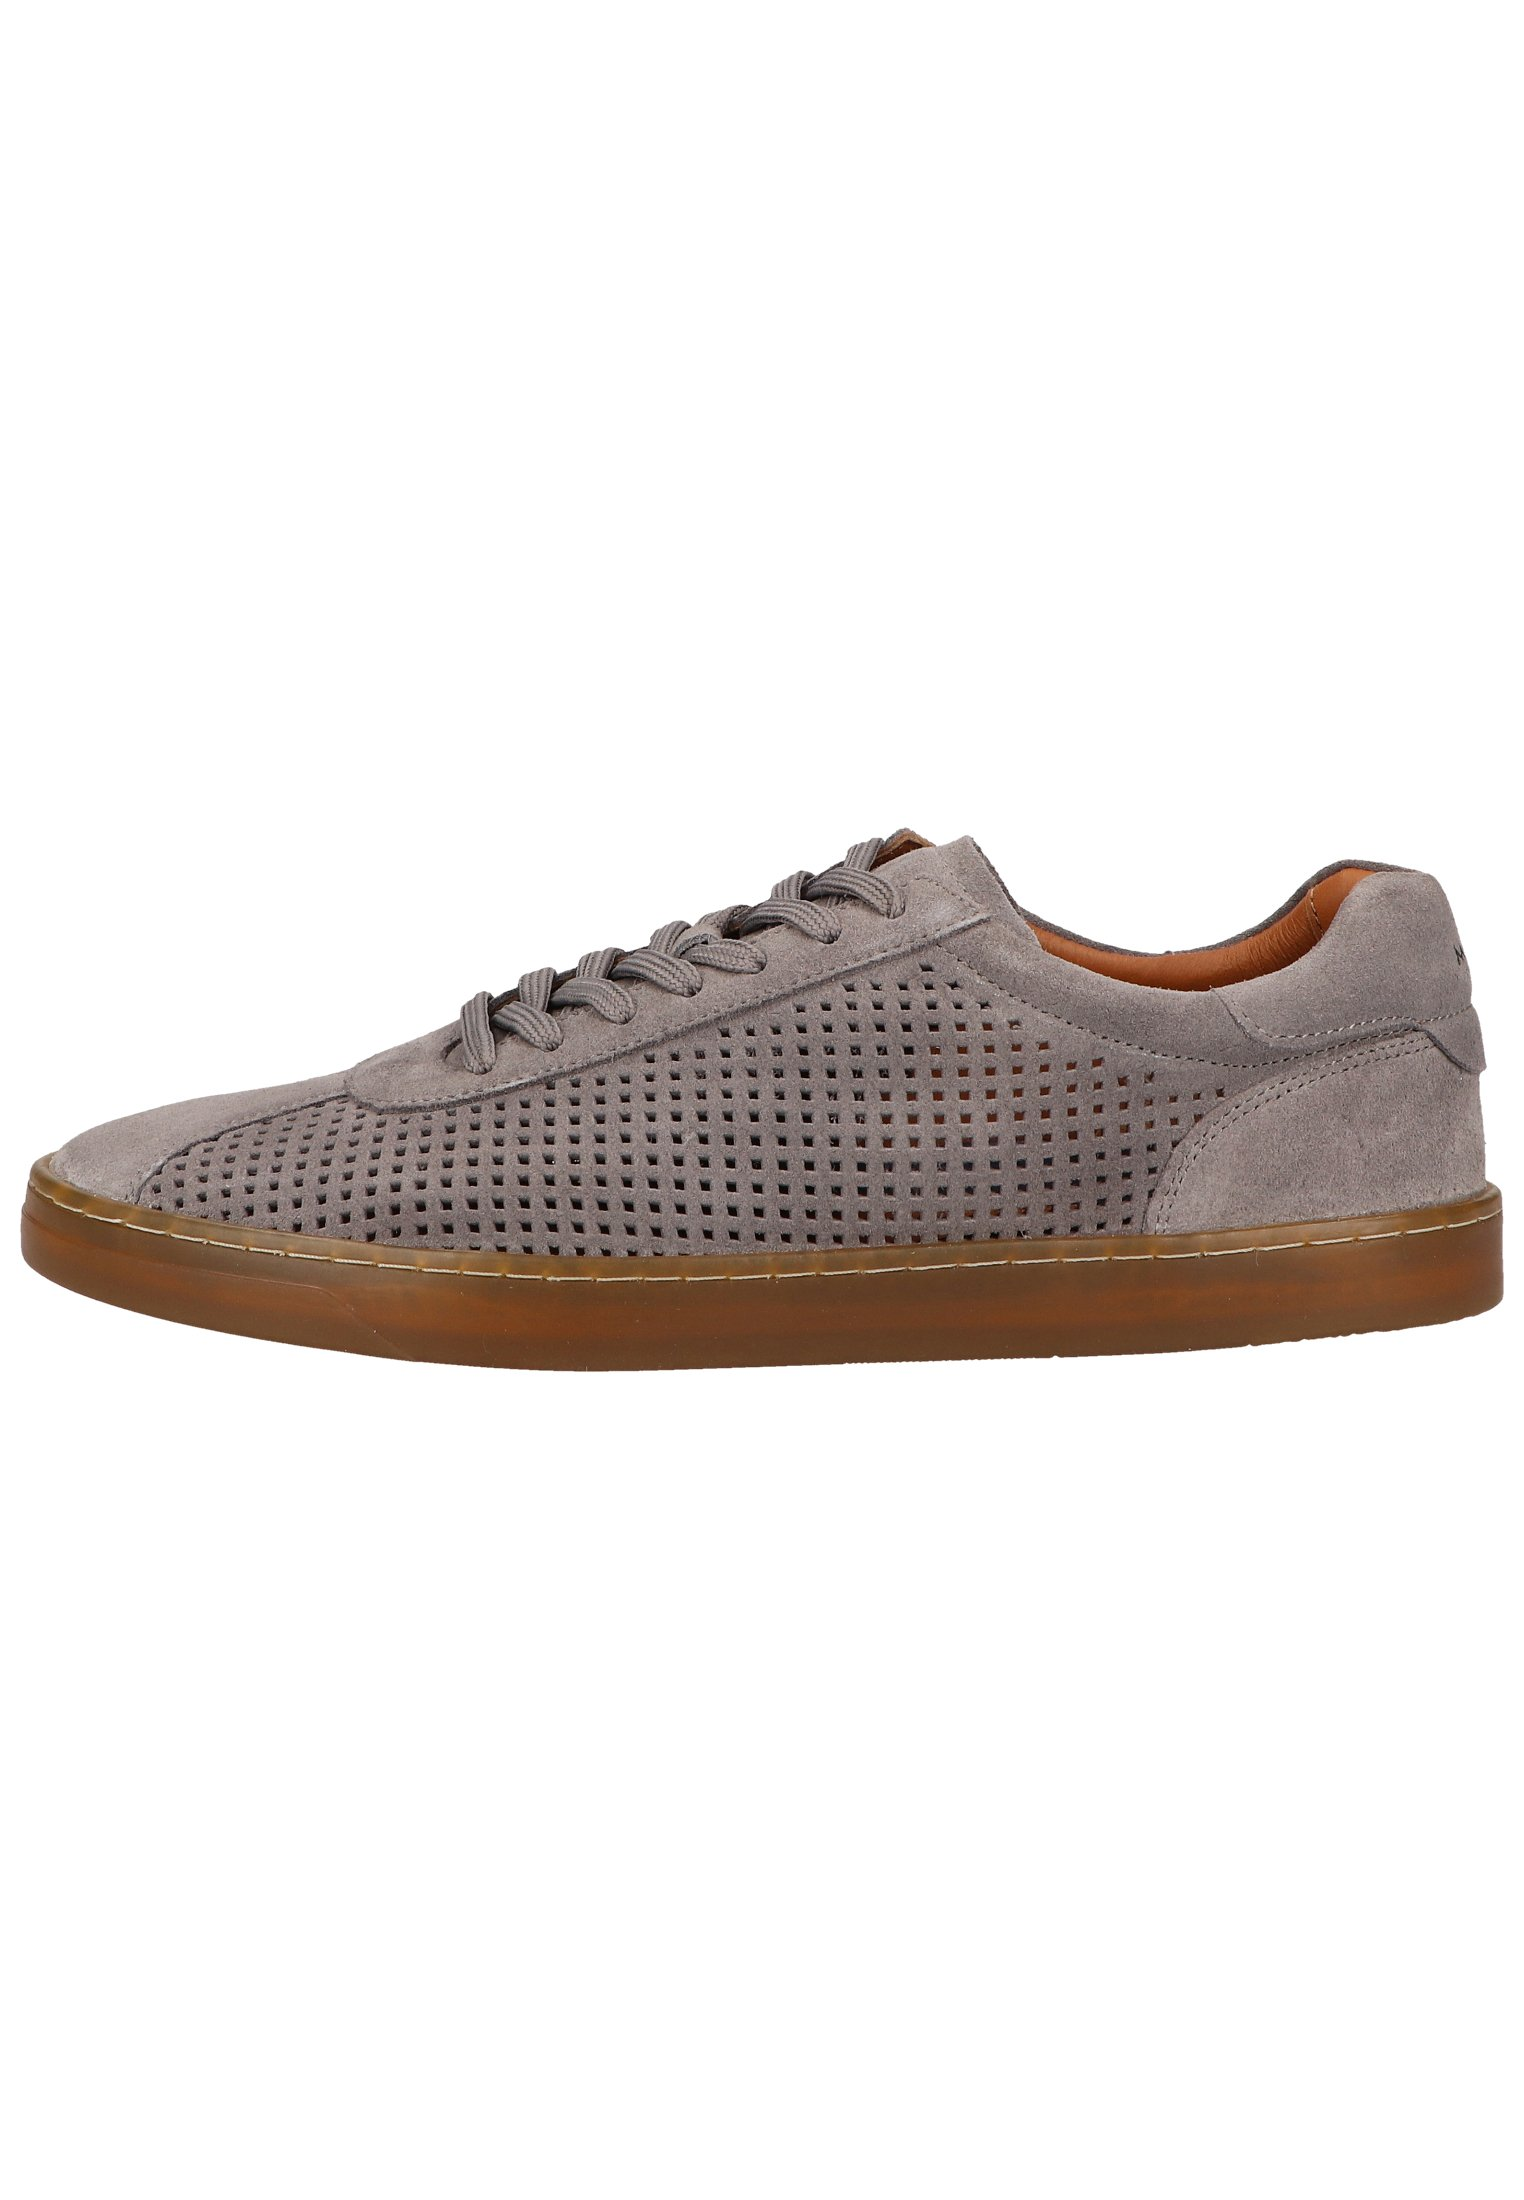 Homme Baskets basses - grey